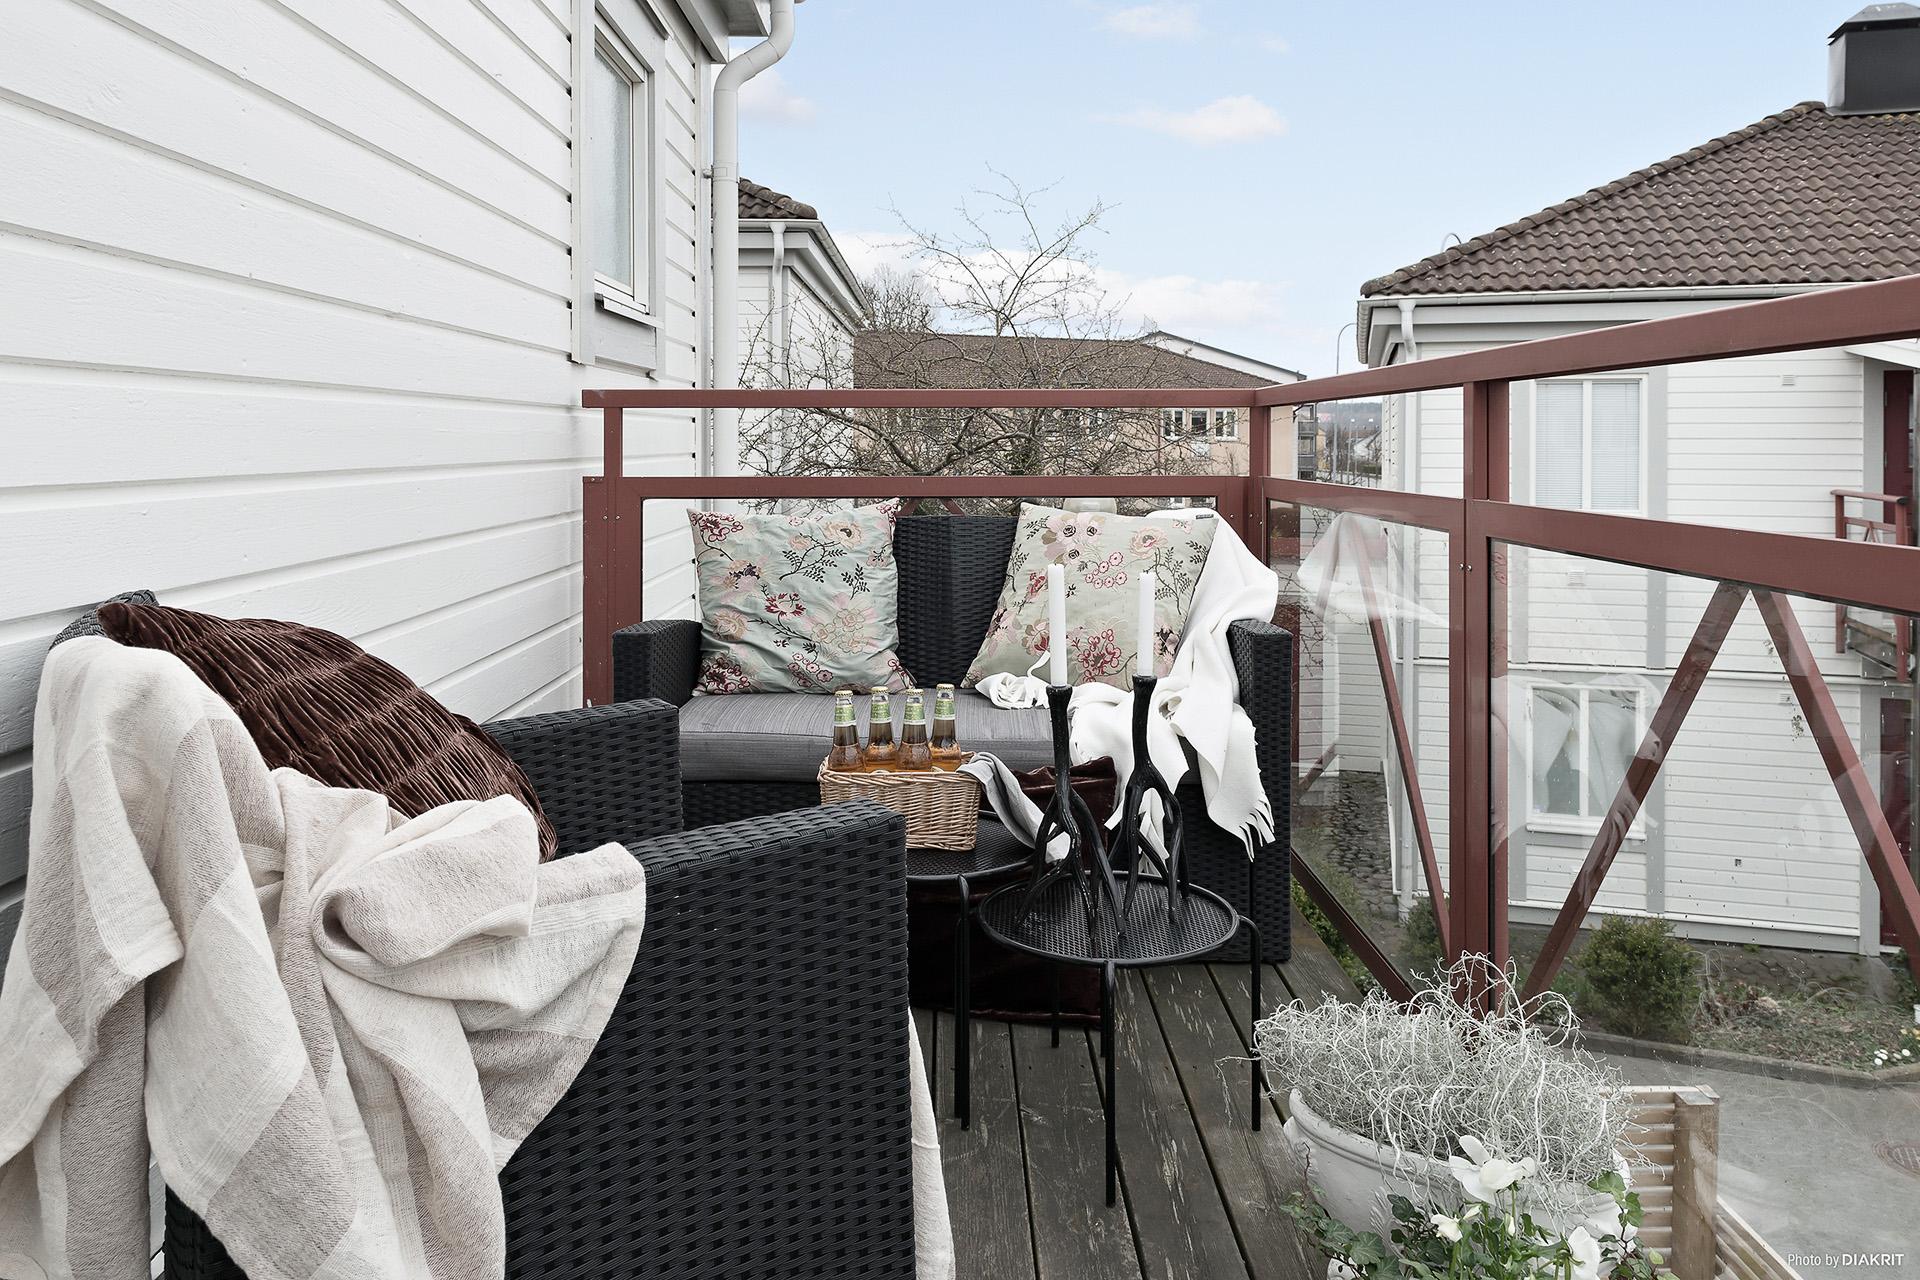 Härlig balkong!